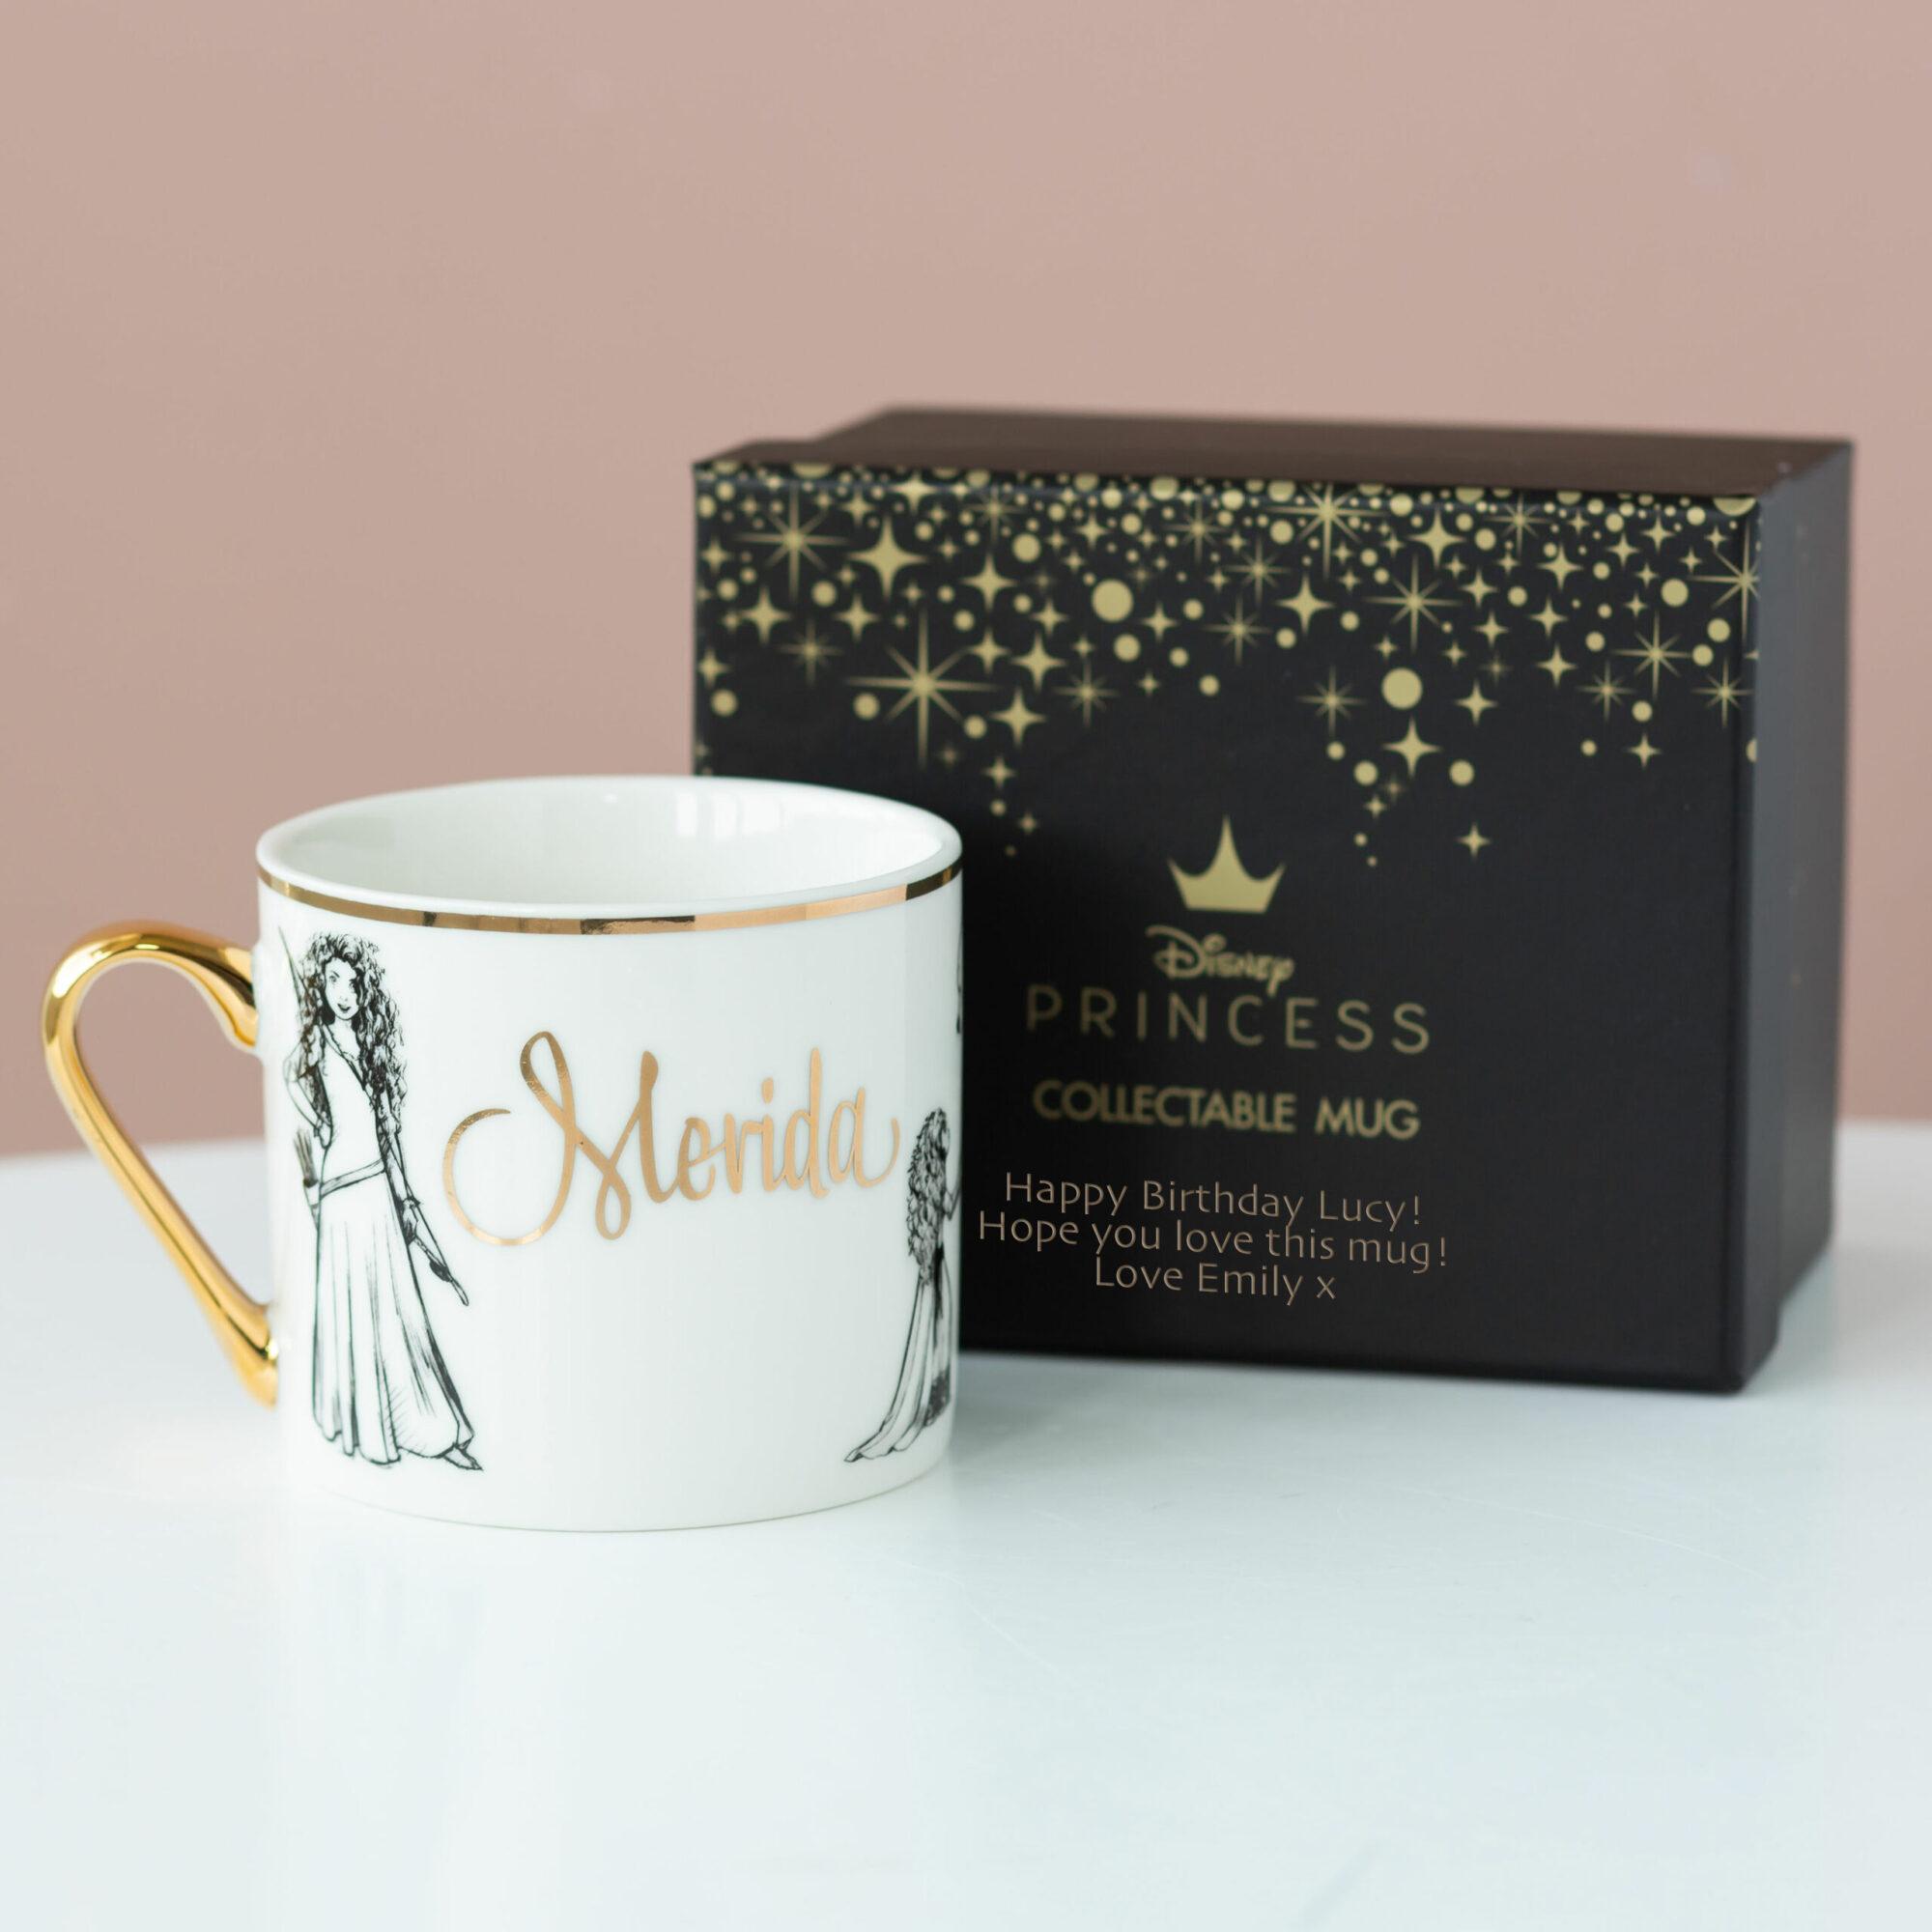 Merida Disney Limited Edition Mug with Personalised Gift Box